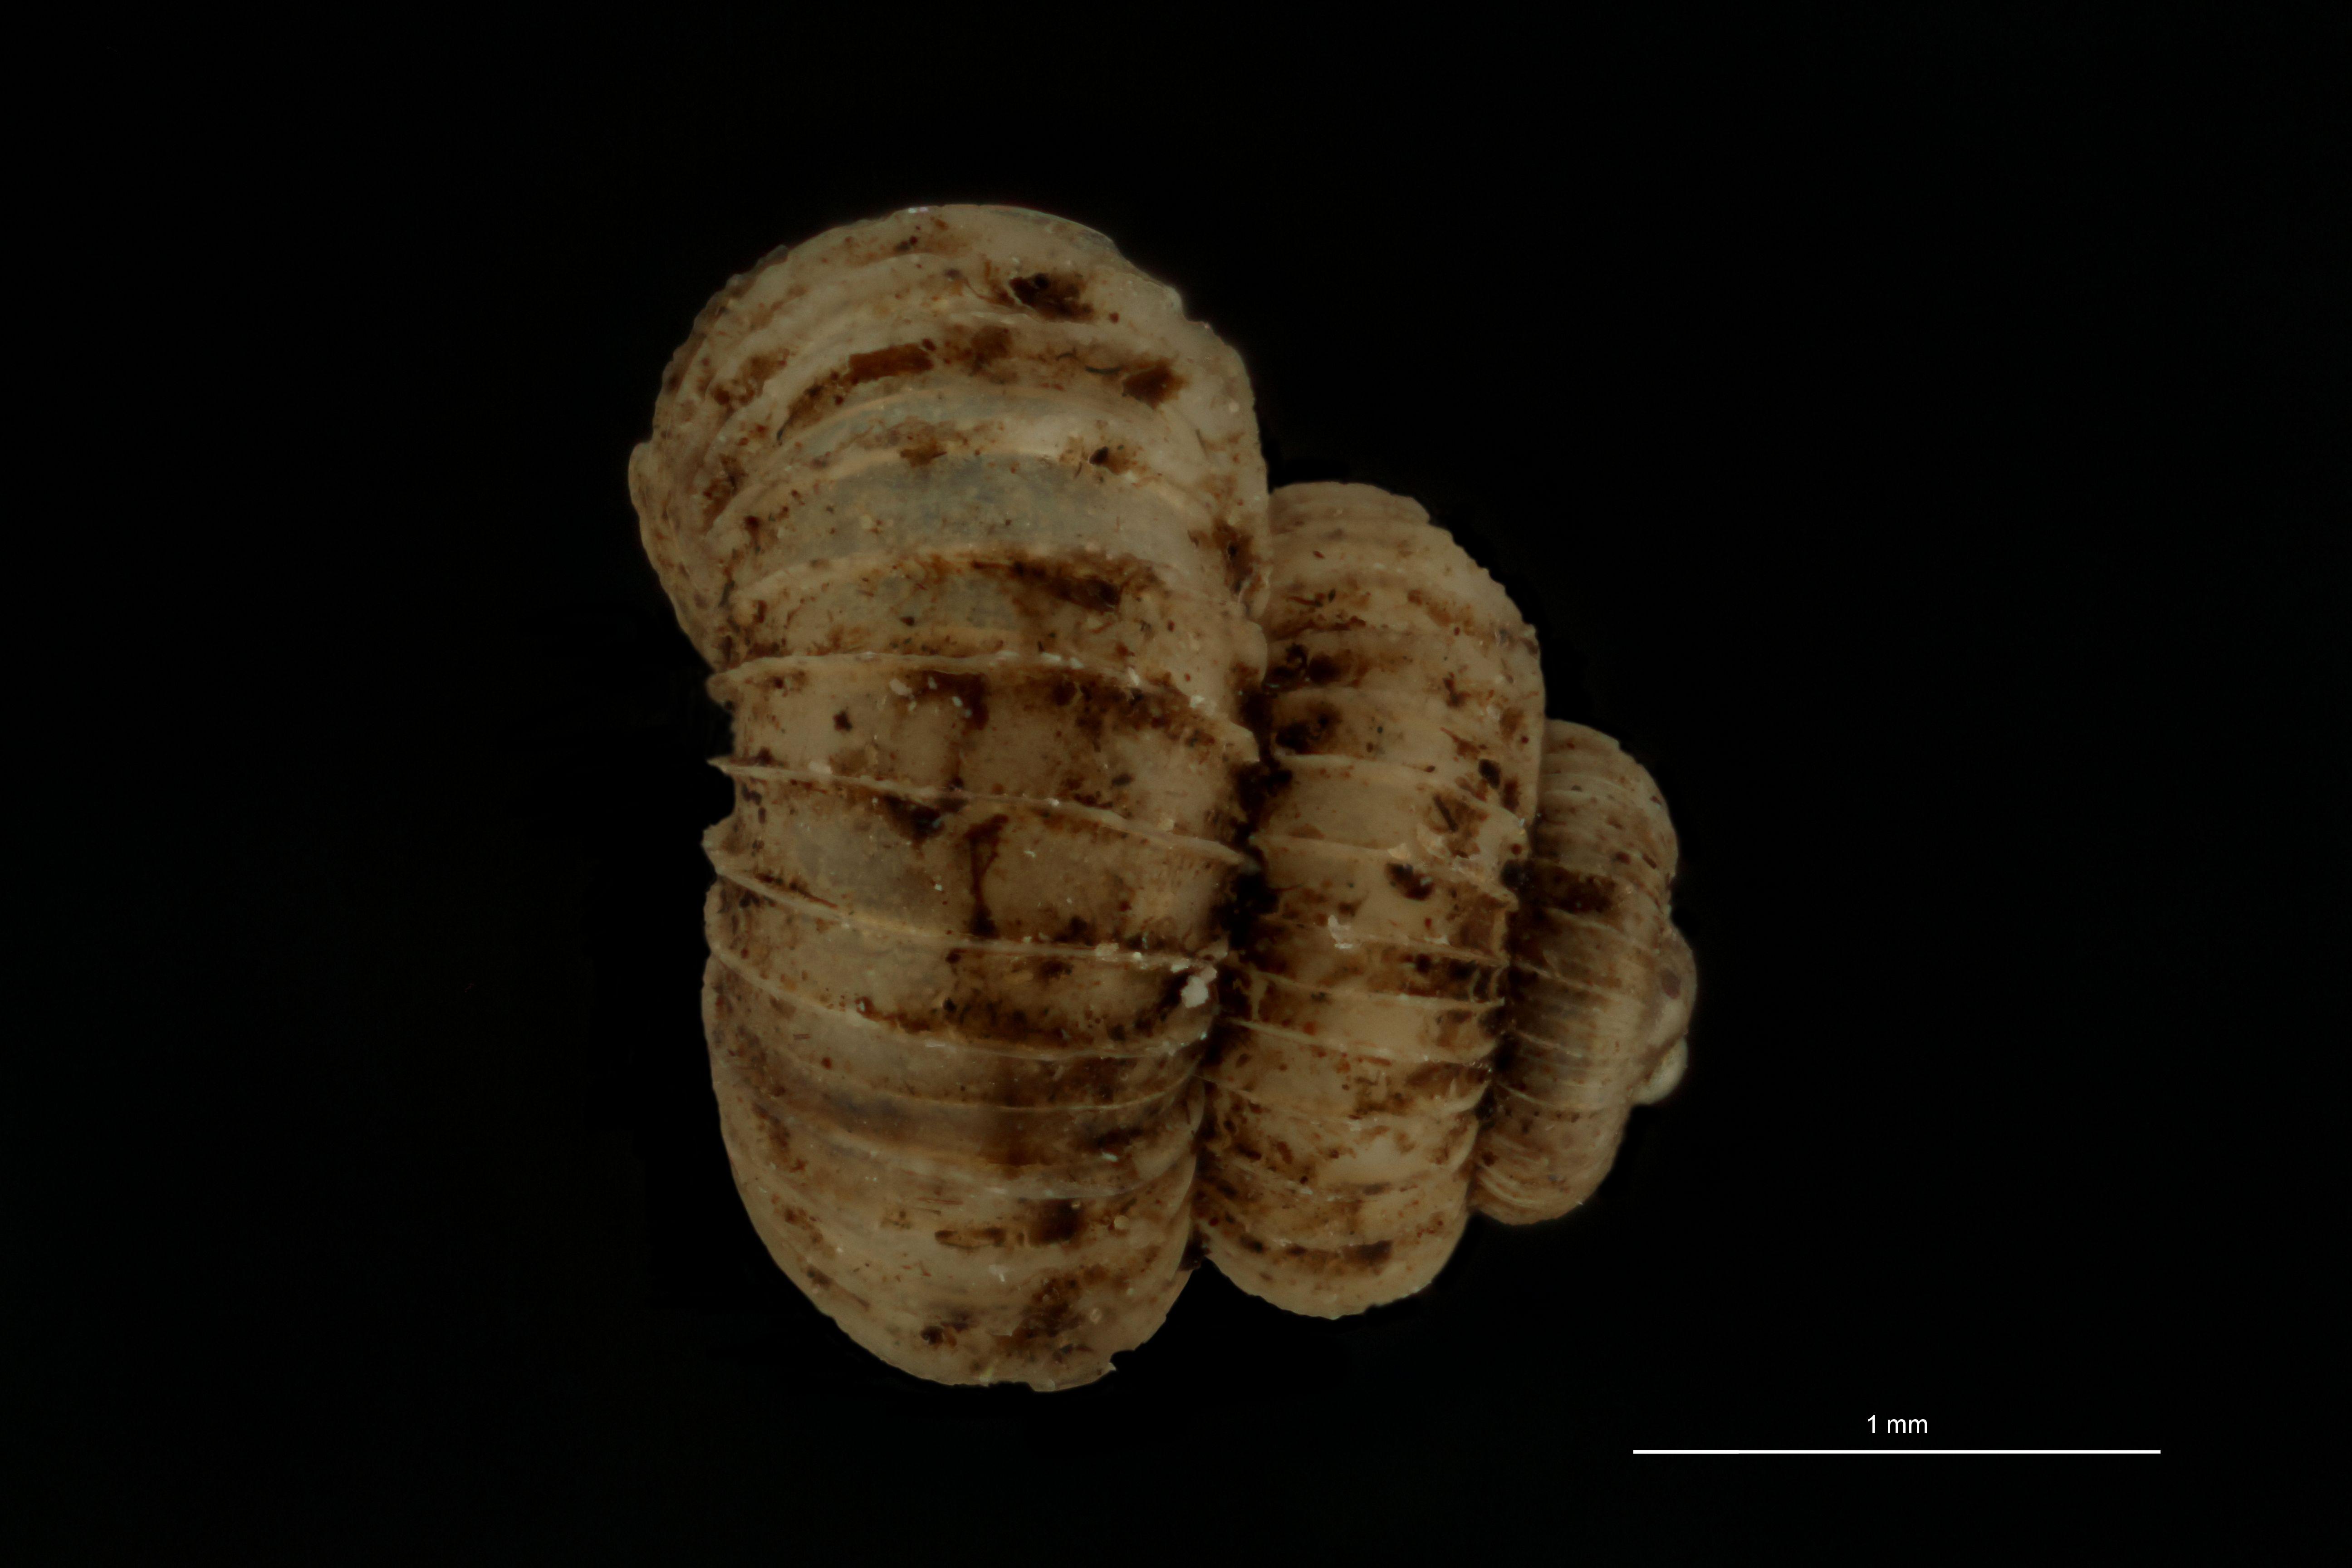 BE-RBINS-INV PARATYPE MT.1016/1 Helicomorpha (Messageria) scalarioides DORSAL.jpg